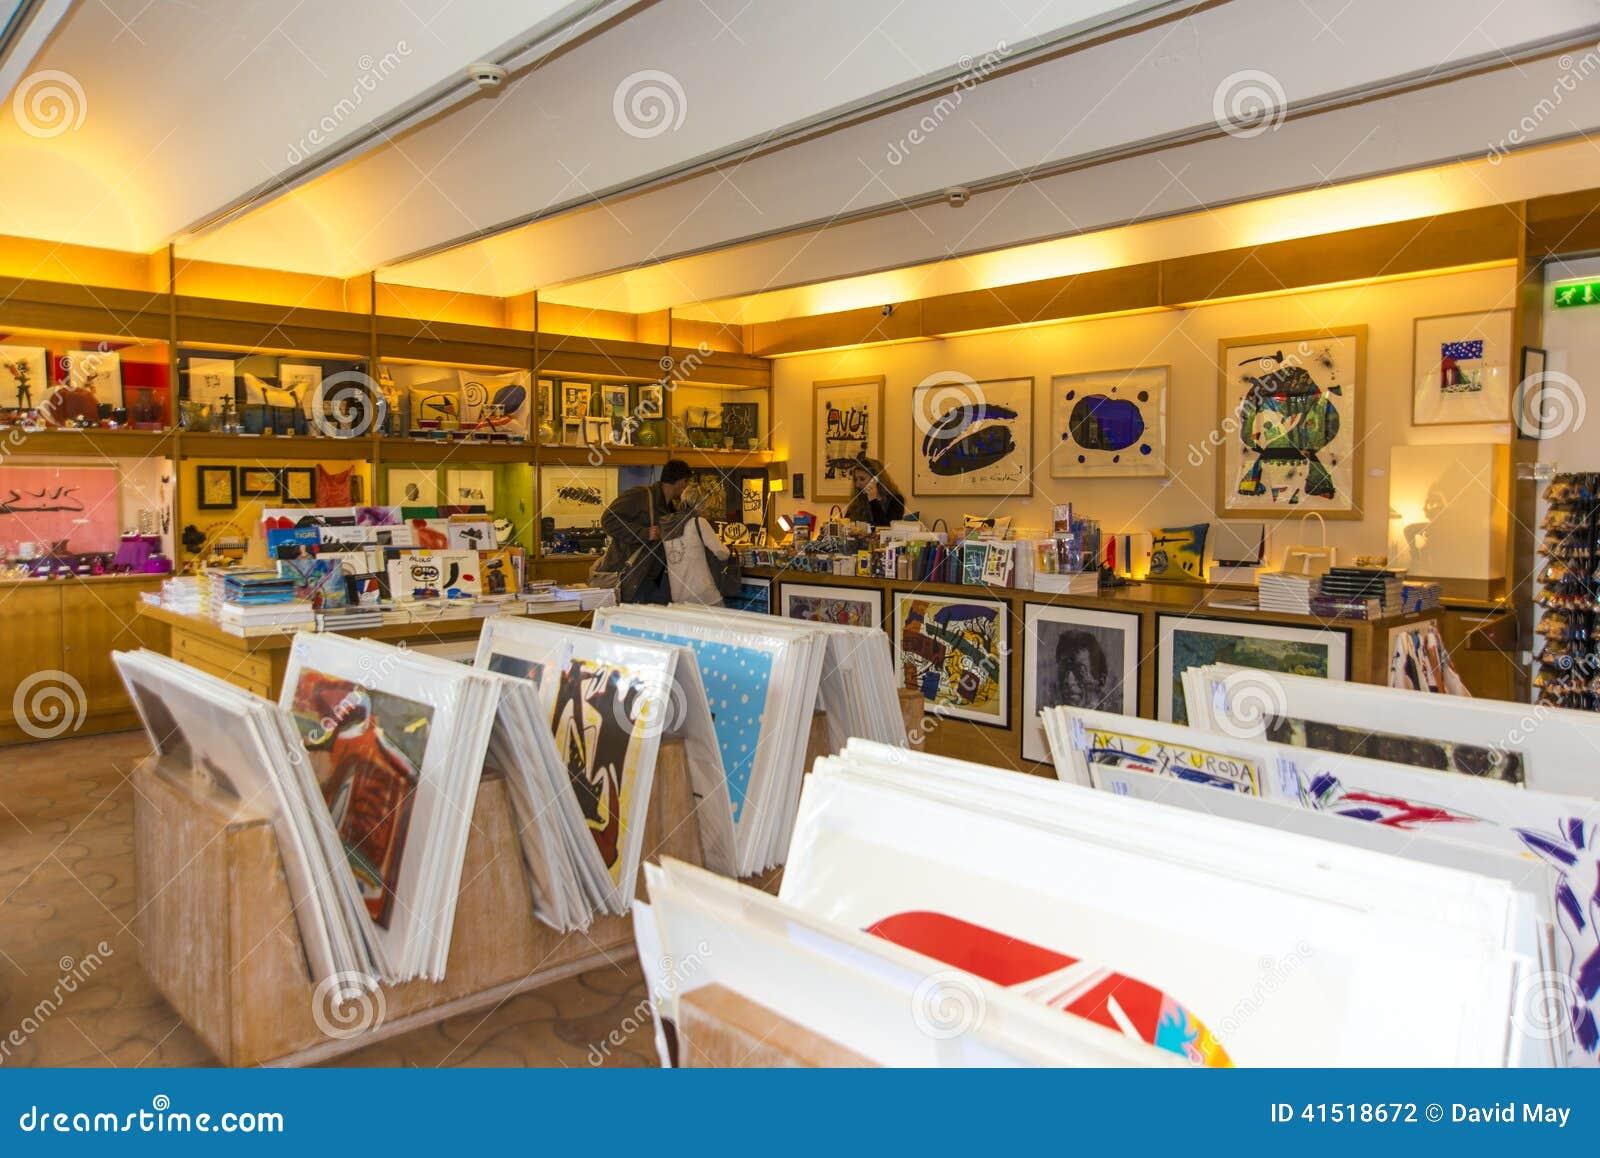 fondation maeght souvenir shop editorial photography. Black Bedroom Furniture Sets. Home Design Ideas